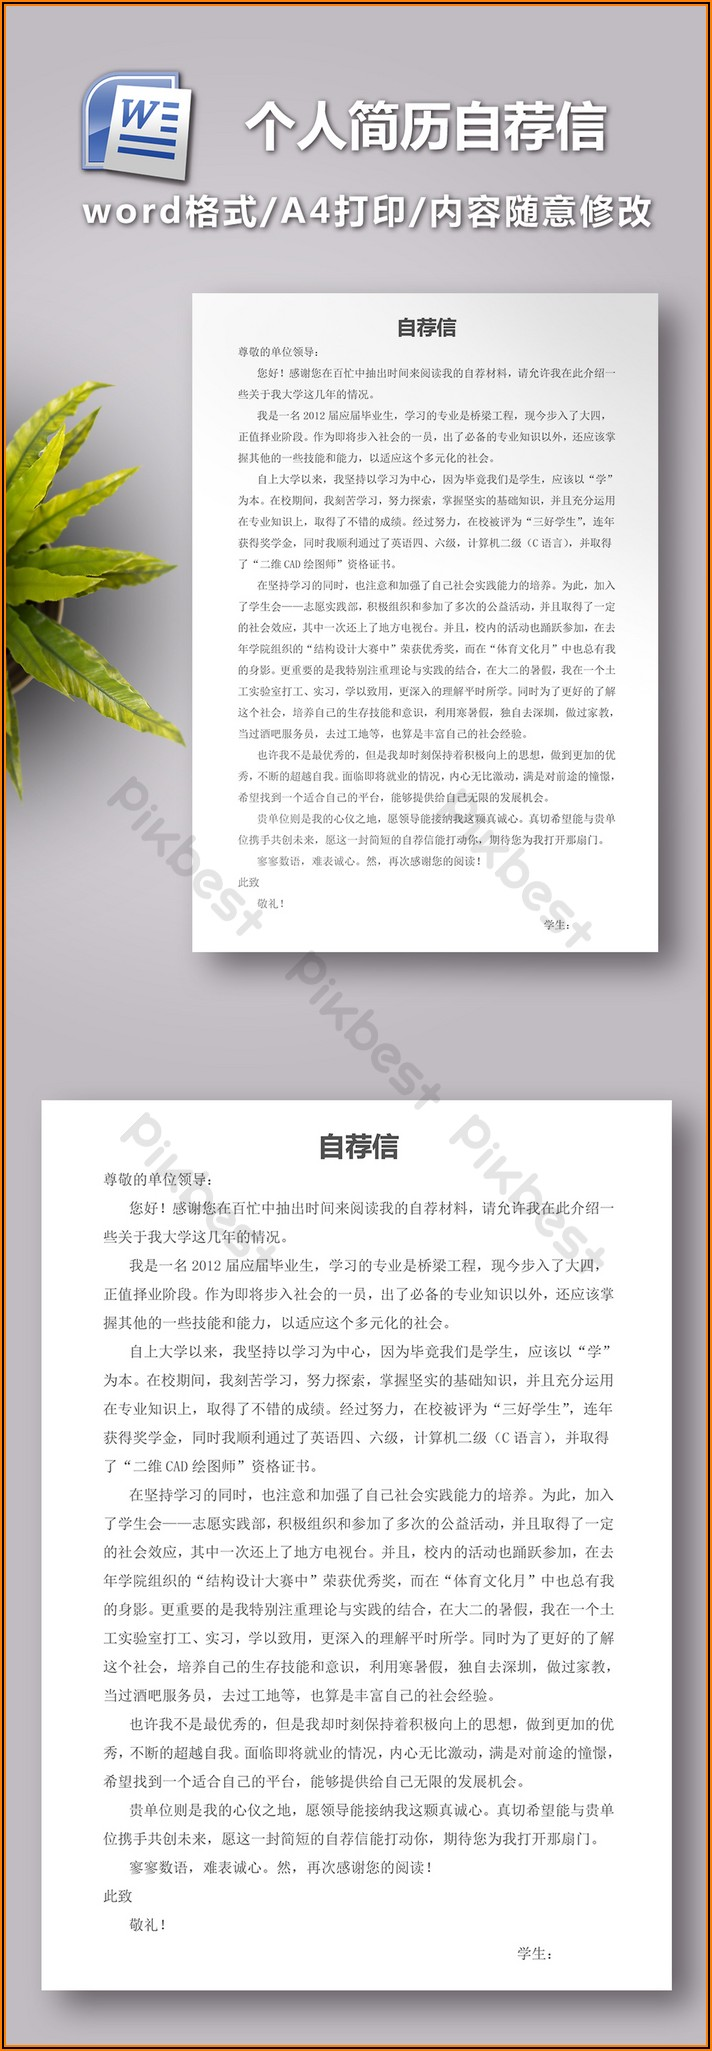 Cv Sample Word Doc Free Download